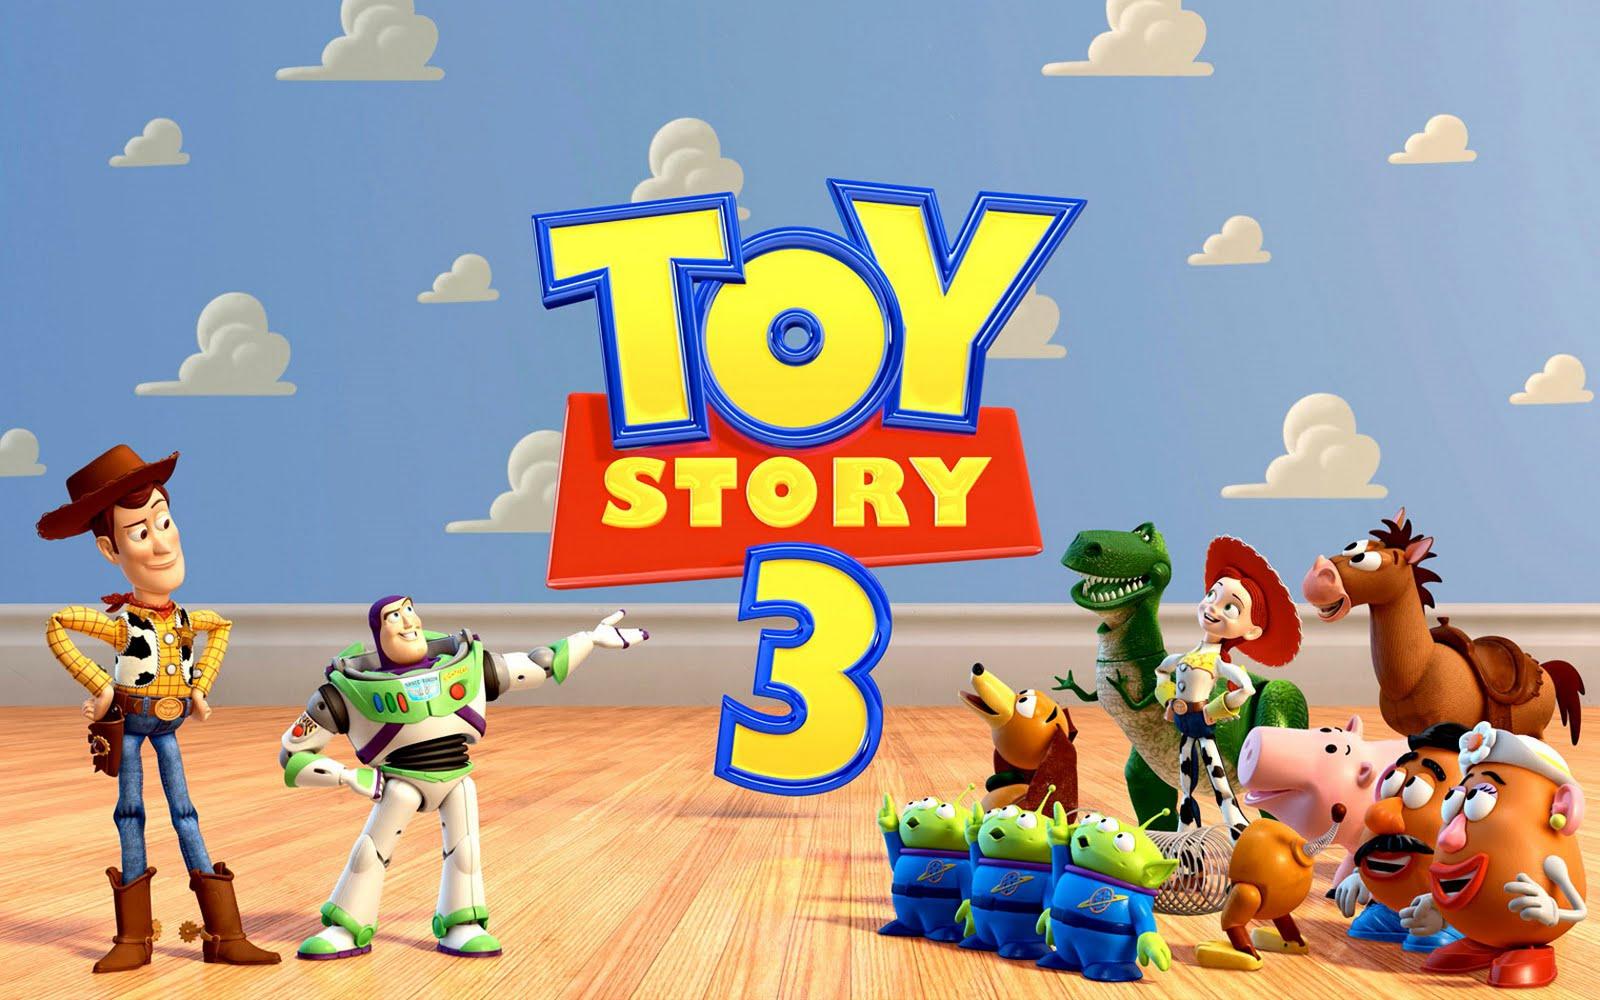 http://3.bp.blogspot.com/_08pG9DYVacg/TJEQb7FM-FI/AAAAAAAAAJg/qiuhKSo_KKw/s1600/toy-story-3-wallpaper-characters-logo.jpg